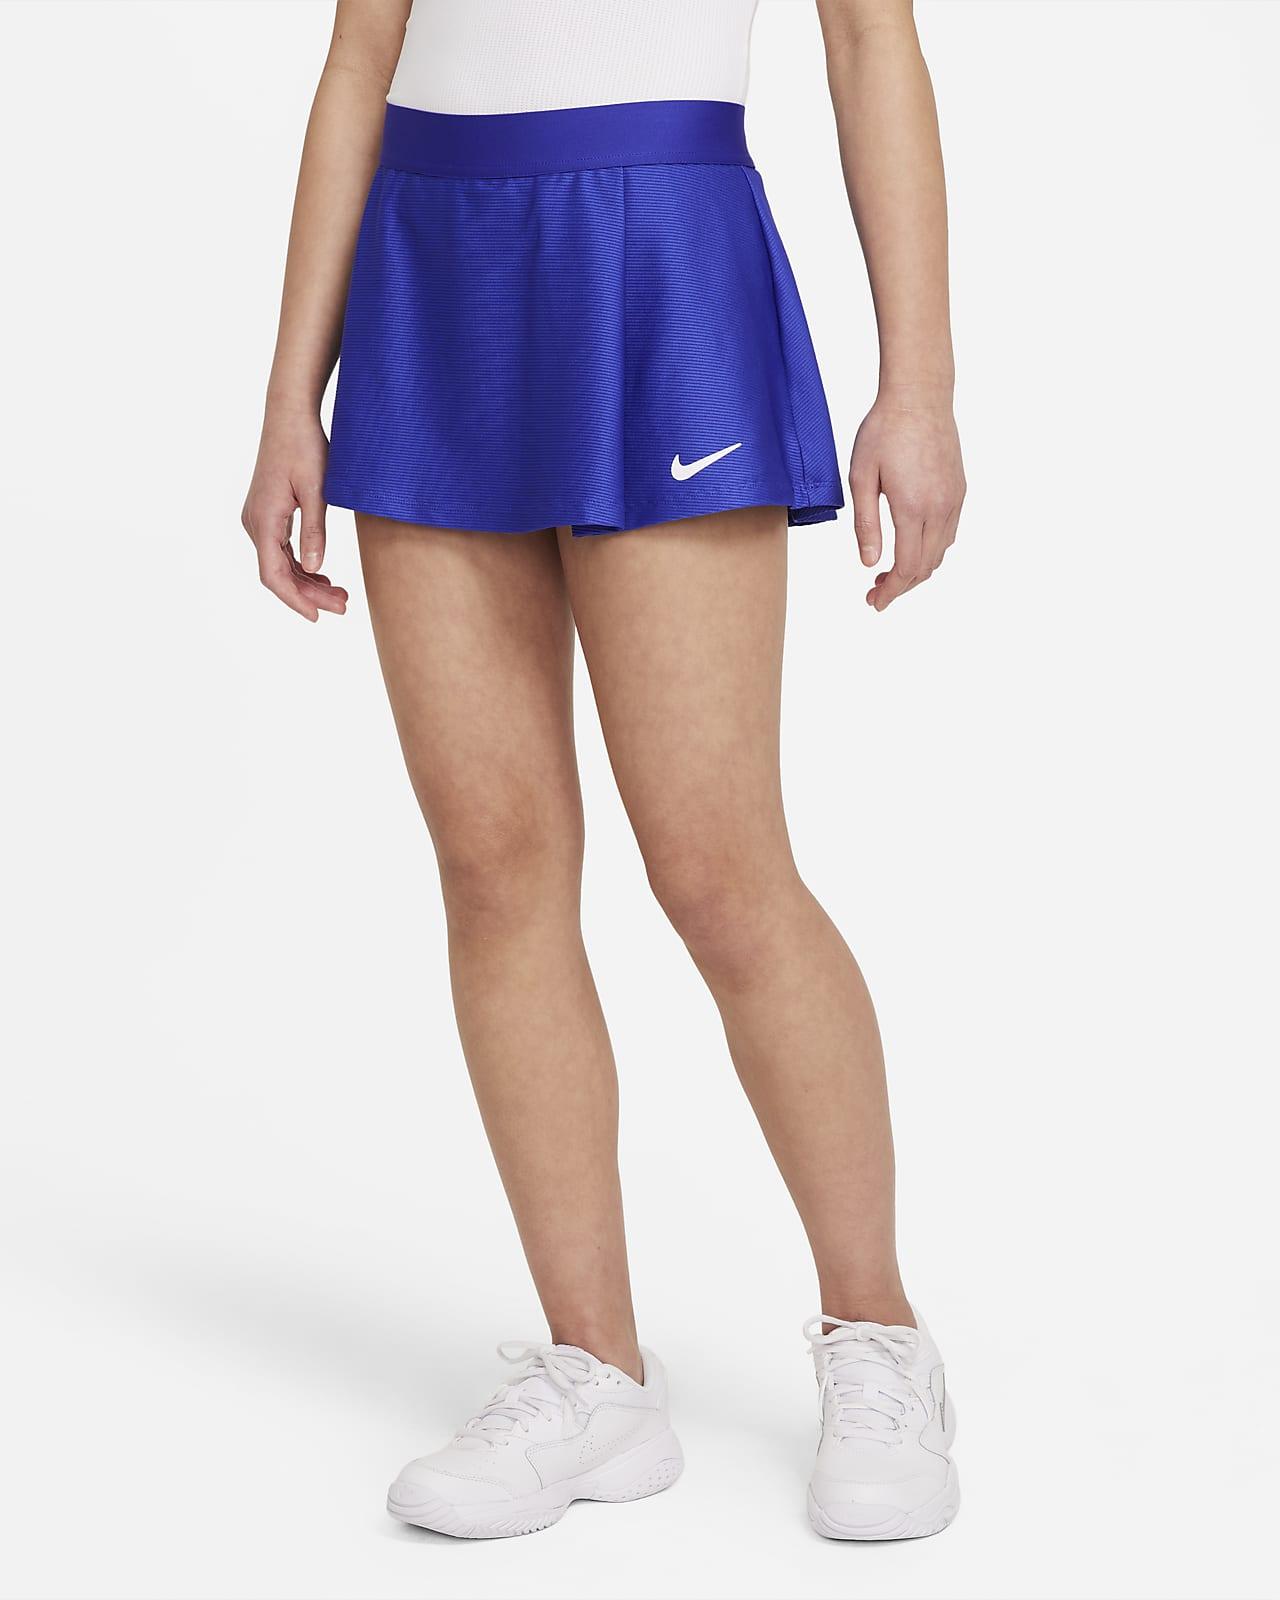 Gonna da tennis NikeCourt Victory - Ragazza